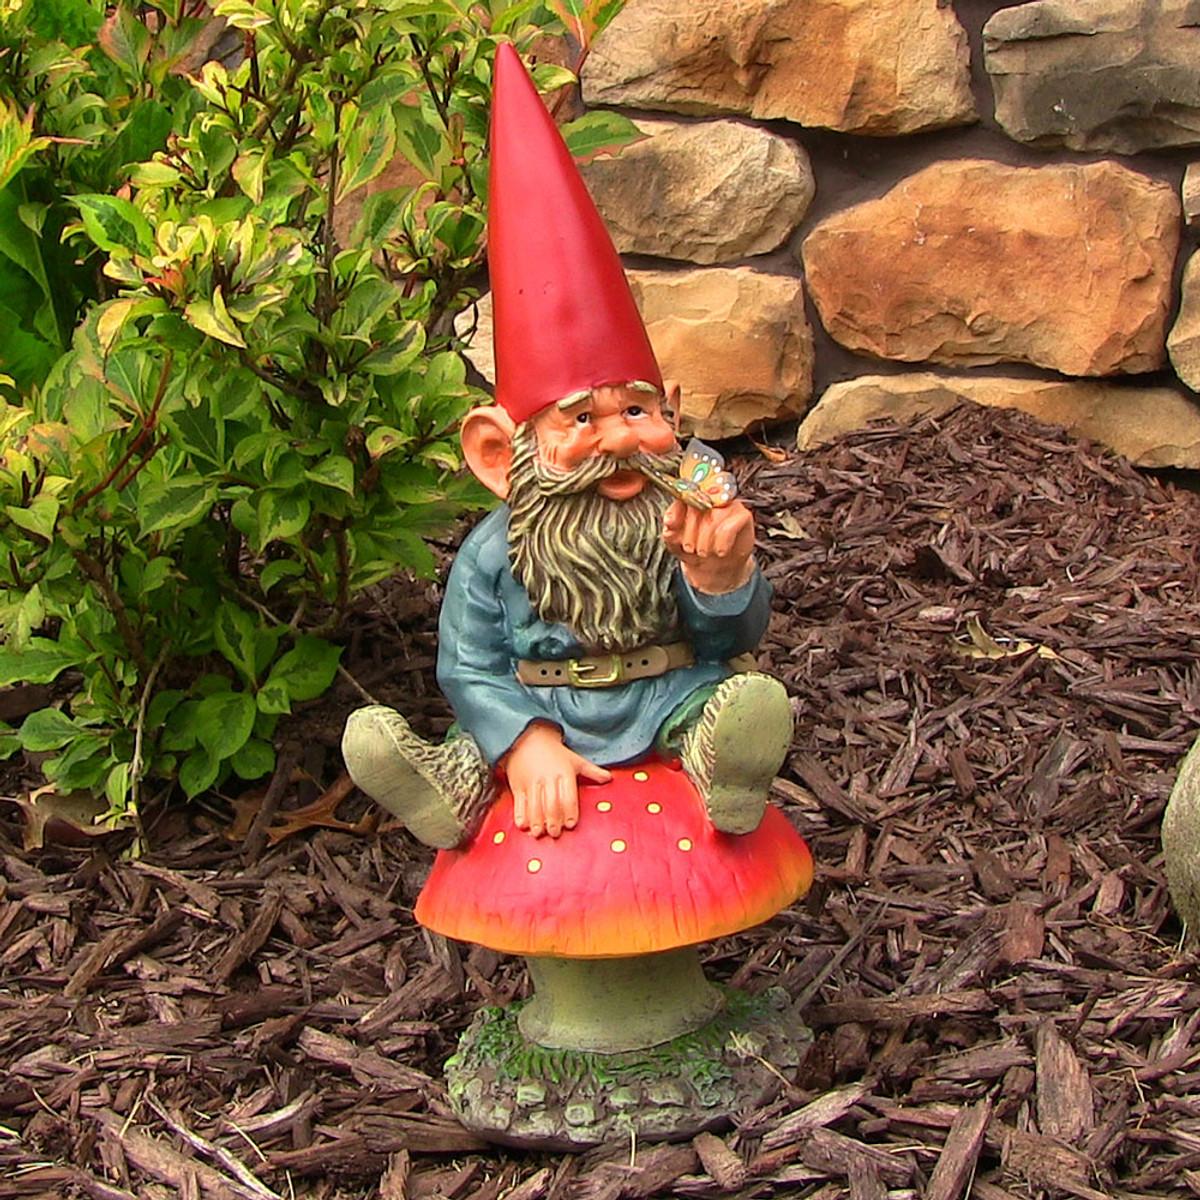 Gnome In Garden: Sunnydaze Adam With Butterfly Garden Gnome